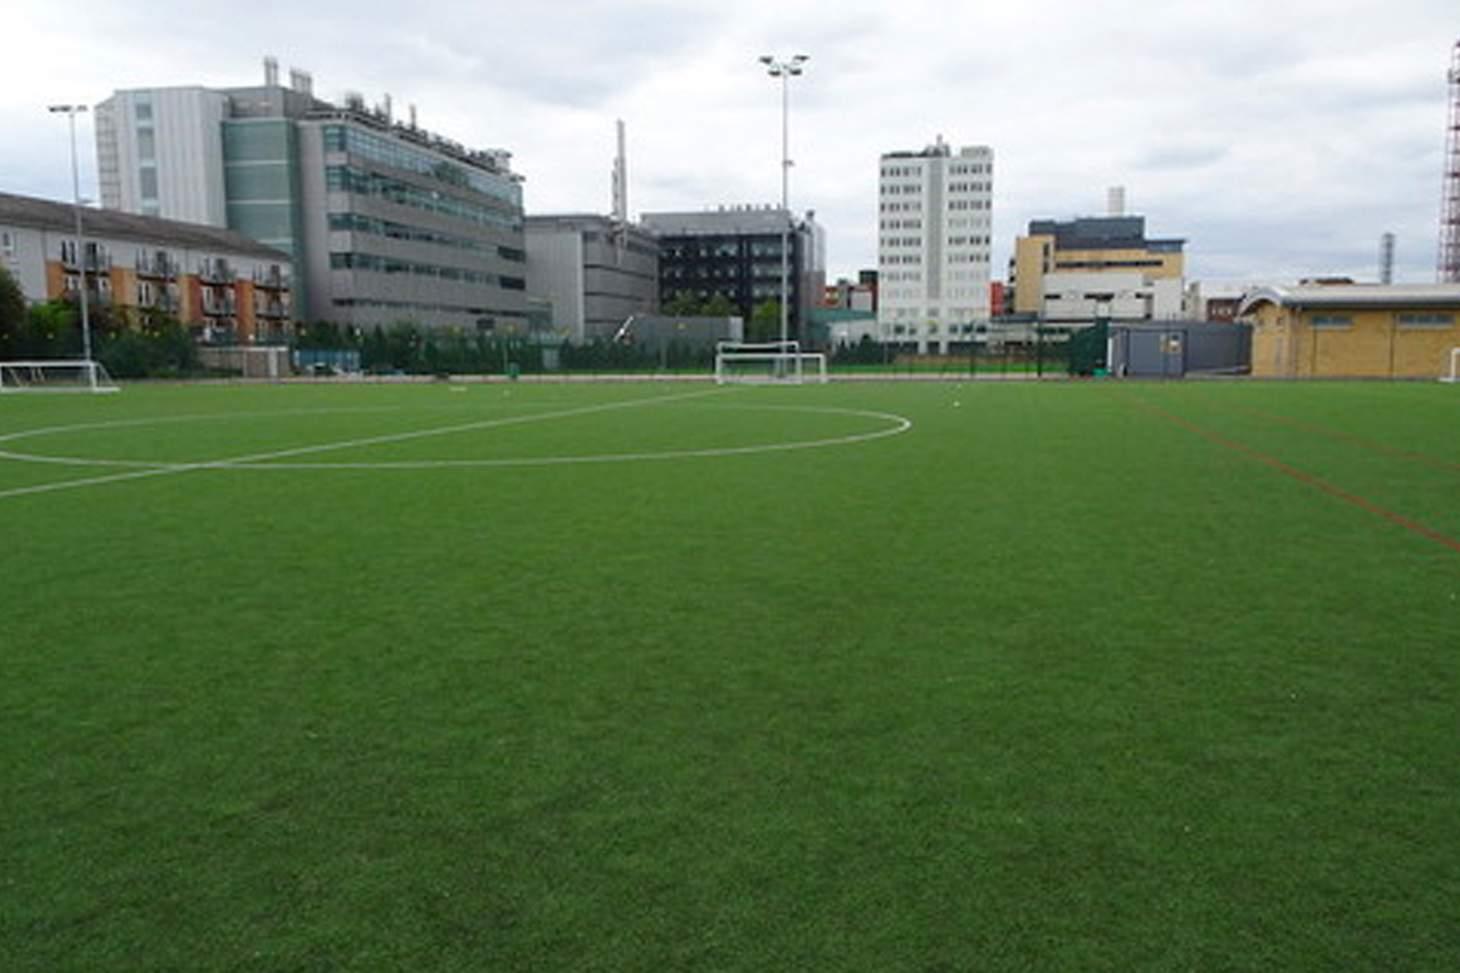 Ark Burlington Danes Academy Outdoor | 3G Astroturf hockey pitch